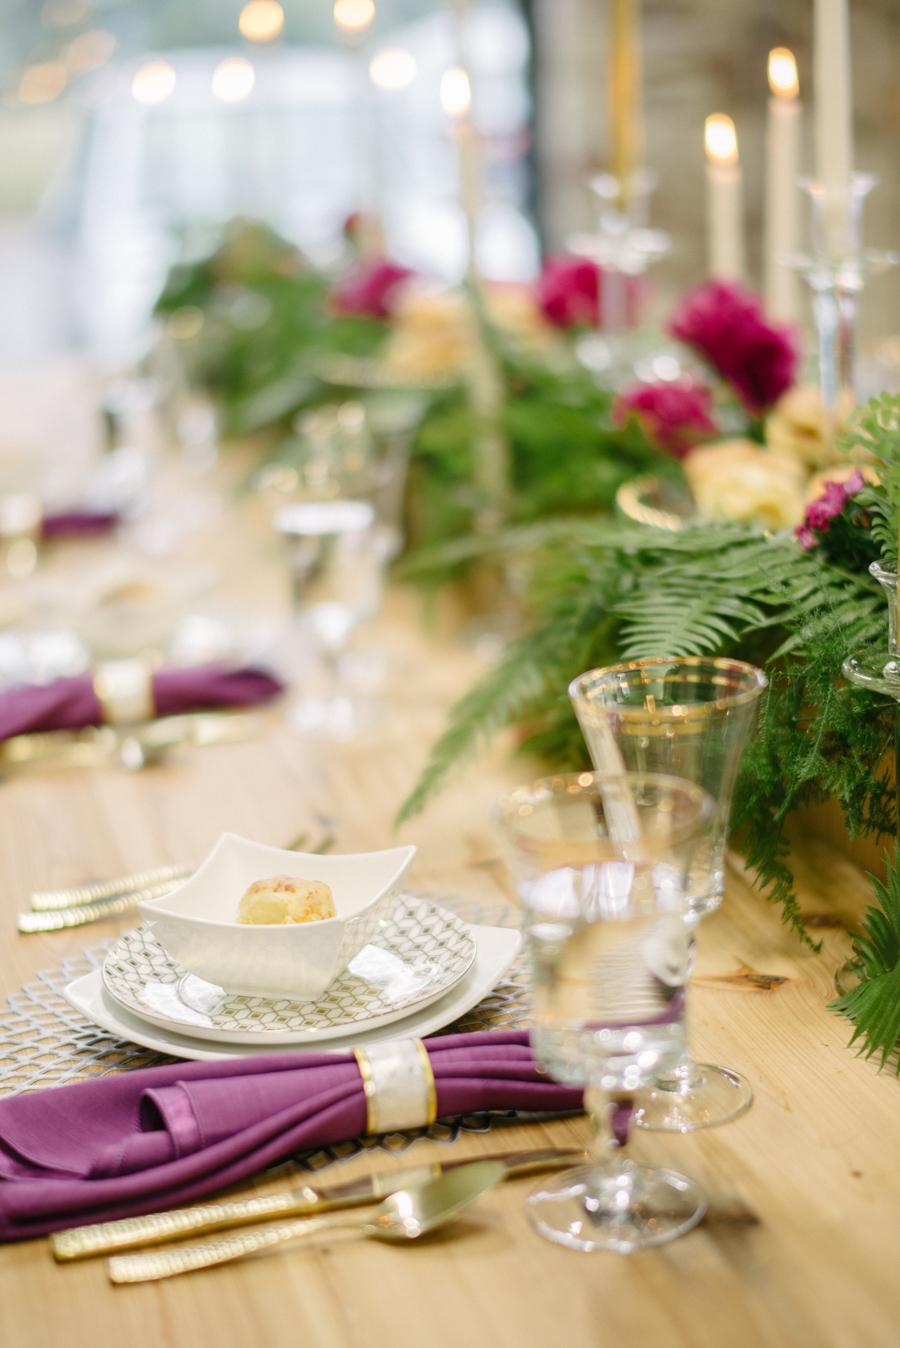 Glam Bachelorette Party Table Setting by Sean Money + Elizabeth Fay